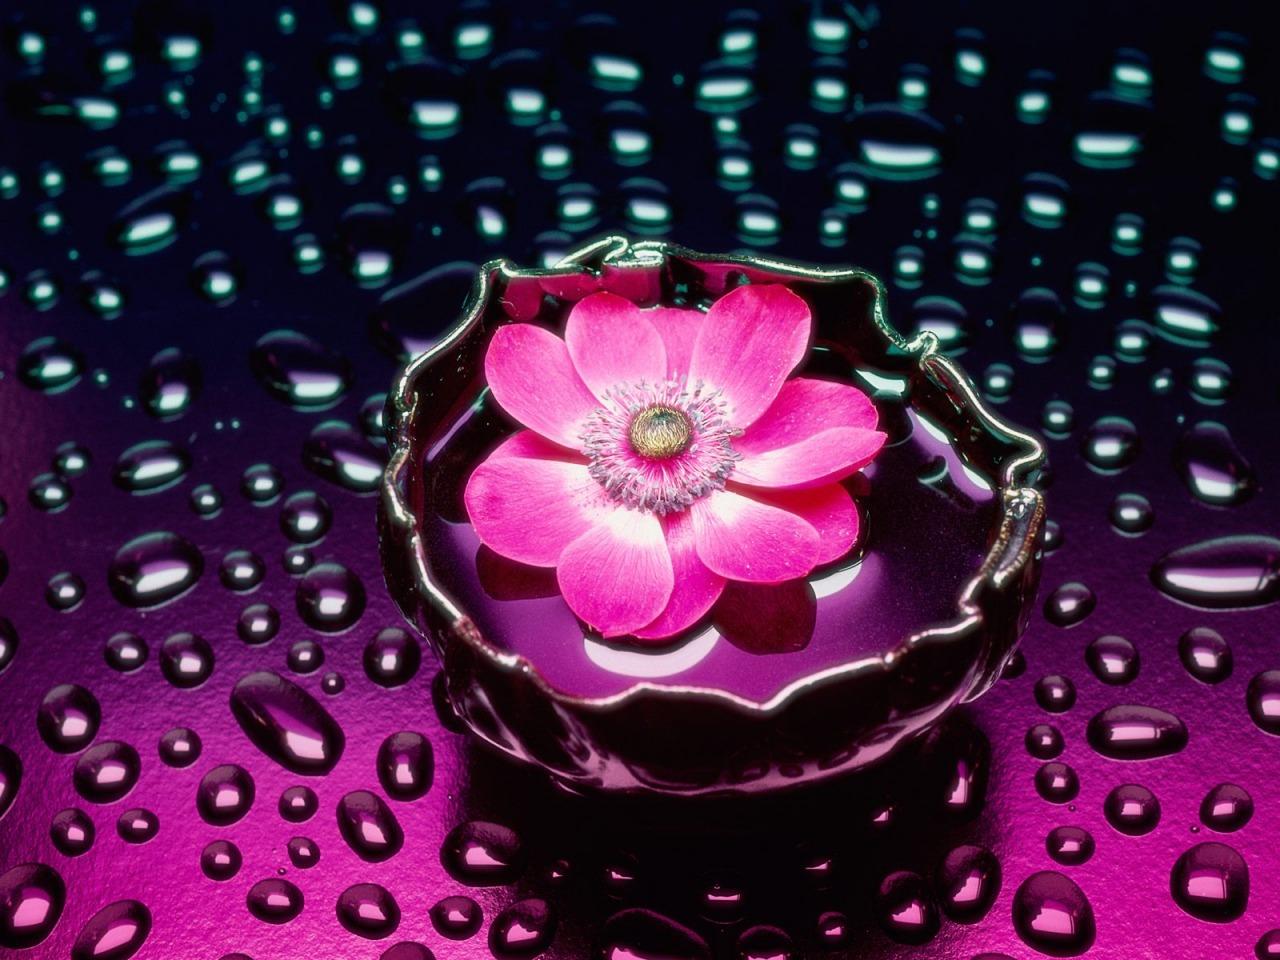 petals and water wallpaper flowers nature wallpapers in jpg format